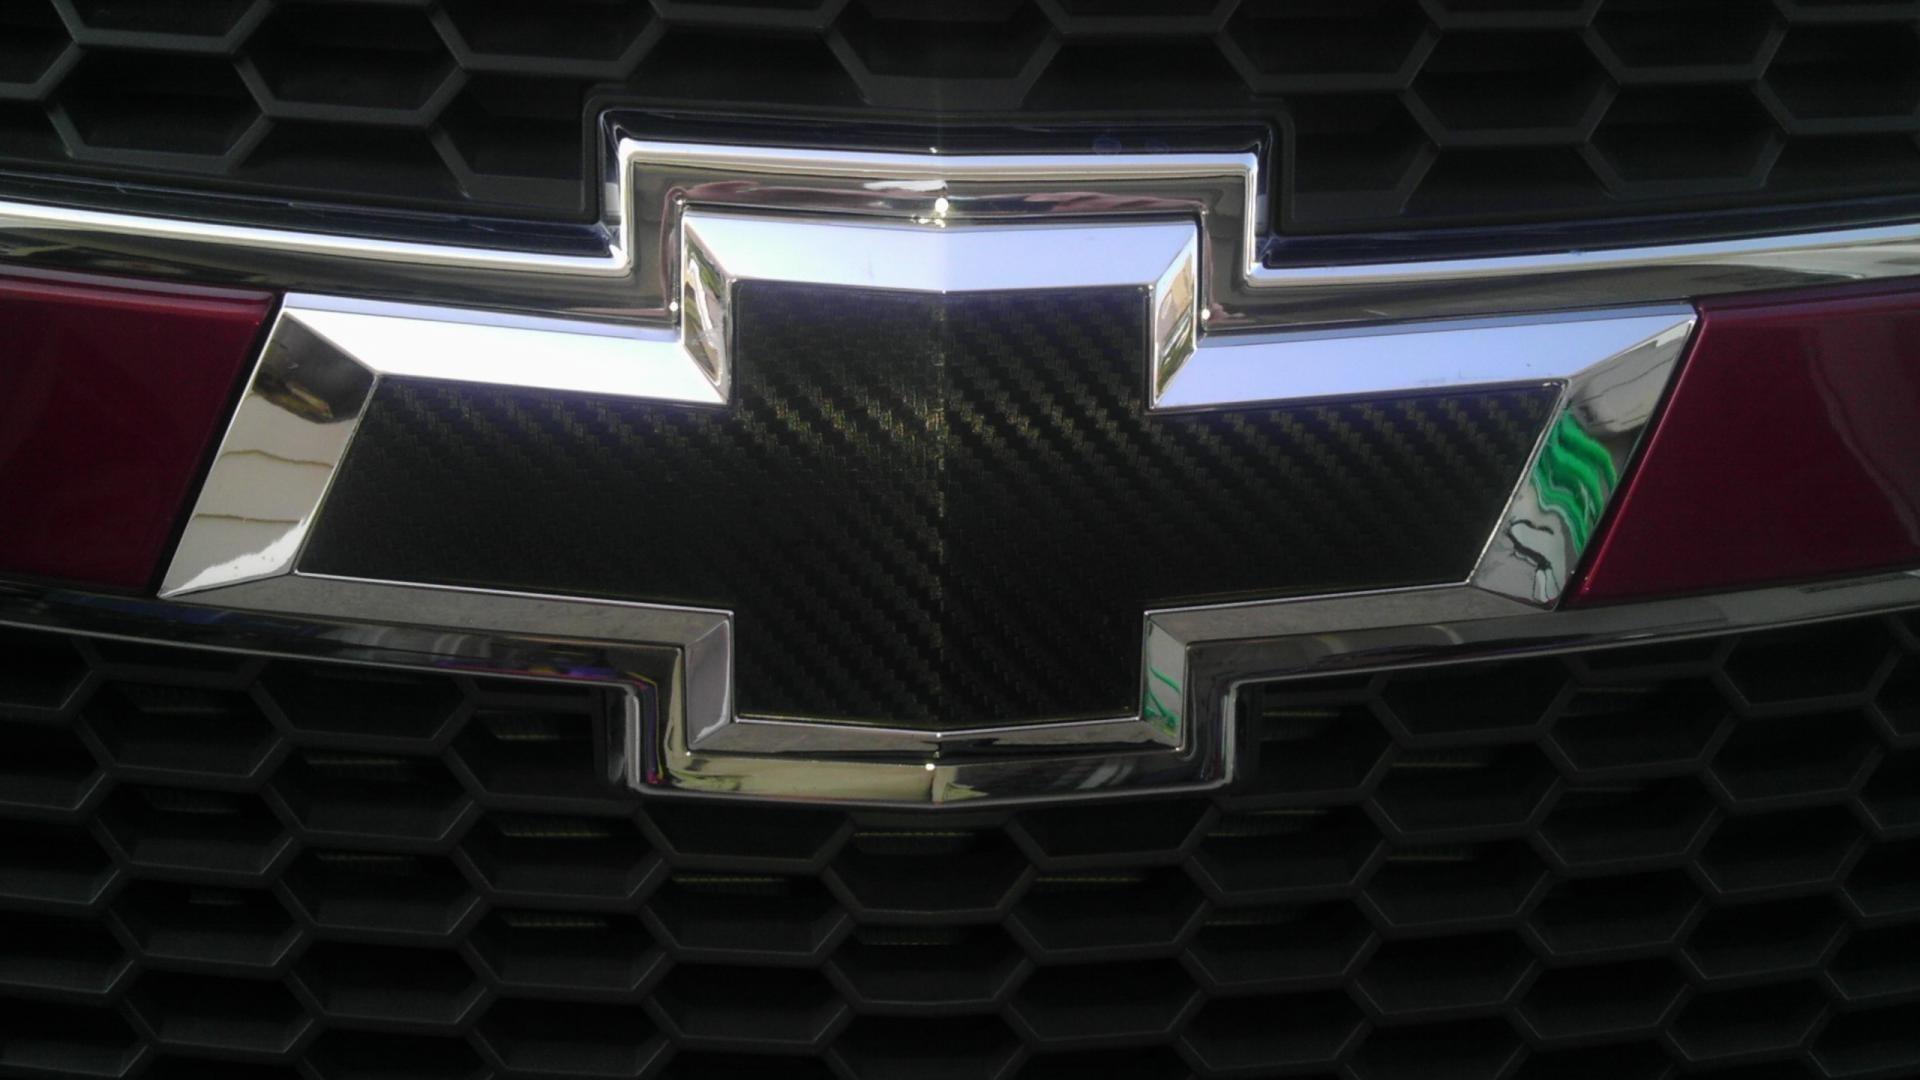 Res: 1920x1080, Free Corvette Logo Wallpapers. b httpsolidlystatedcomdesigncorvpergenerator  b httpsolidlystatedcomdesigncorvpergenerator